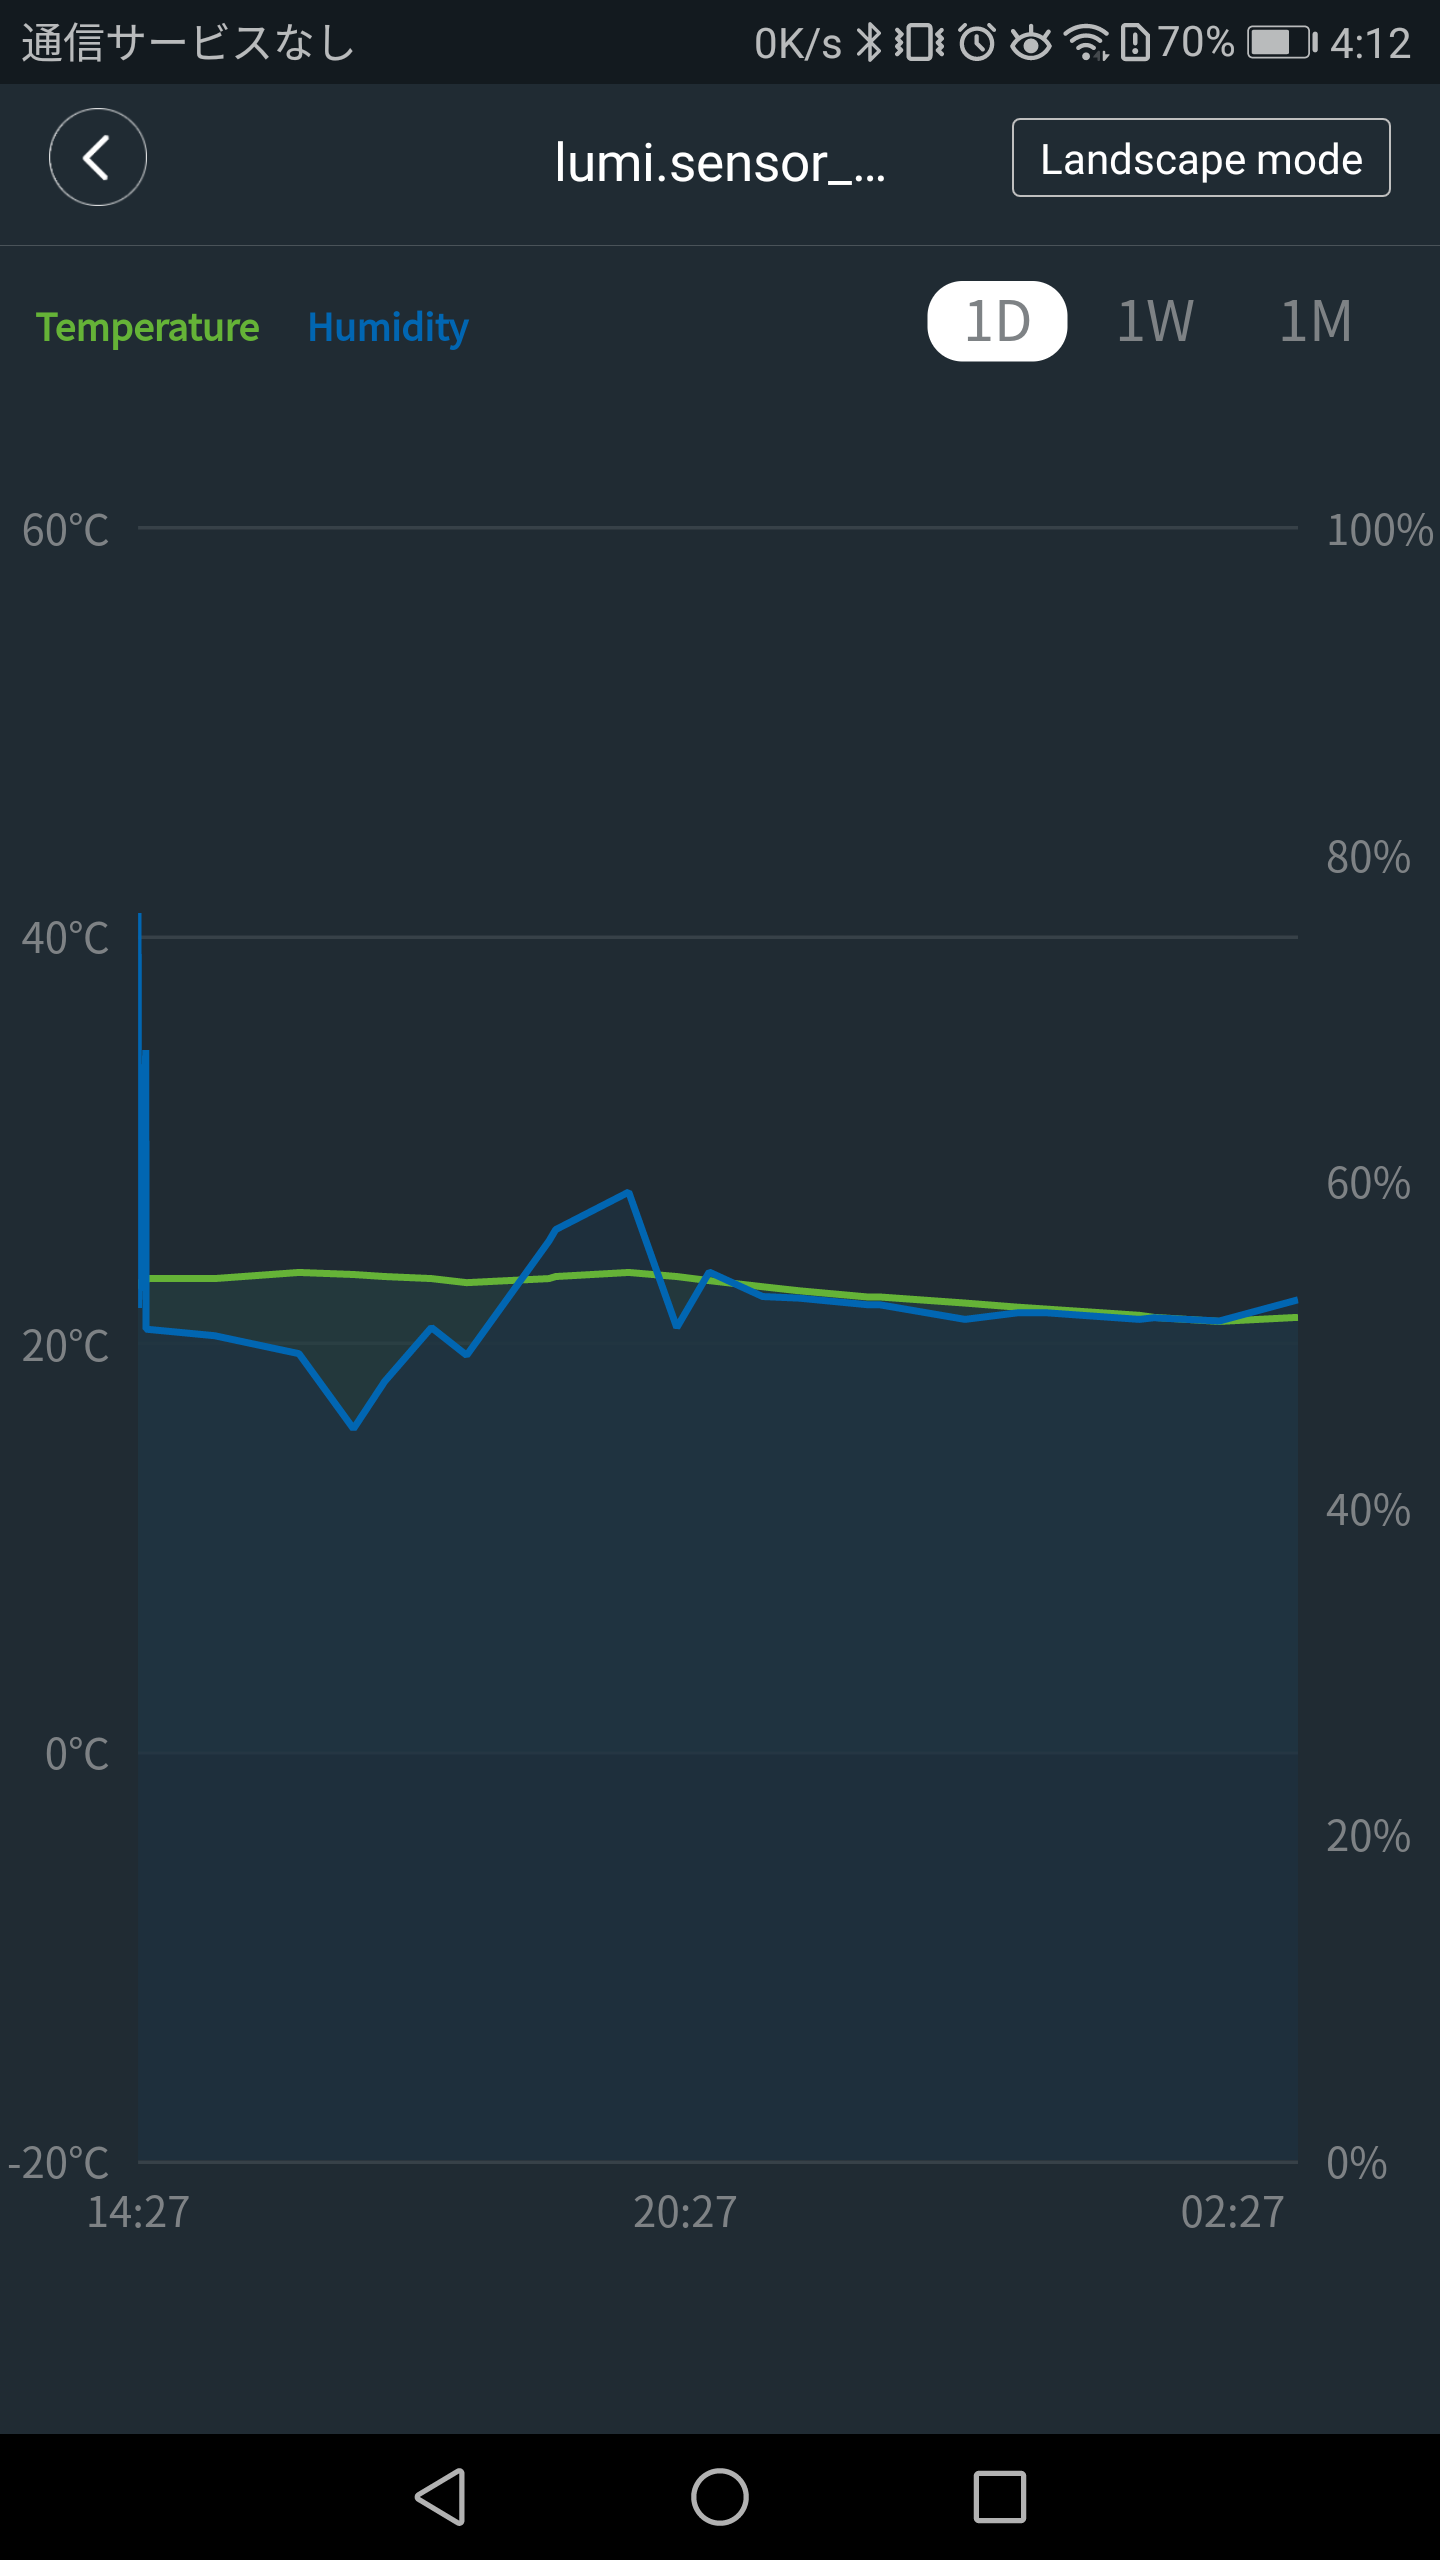 humidityかtemperatureタップでグラフ表示